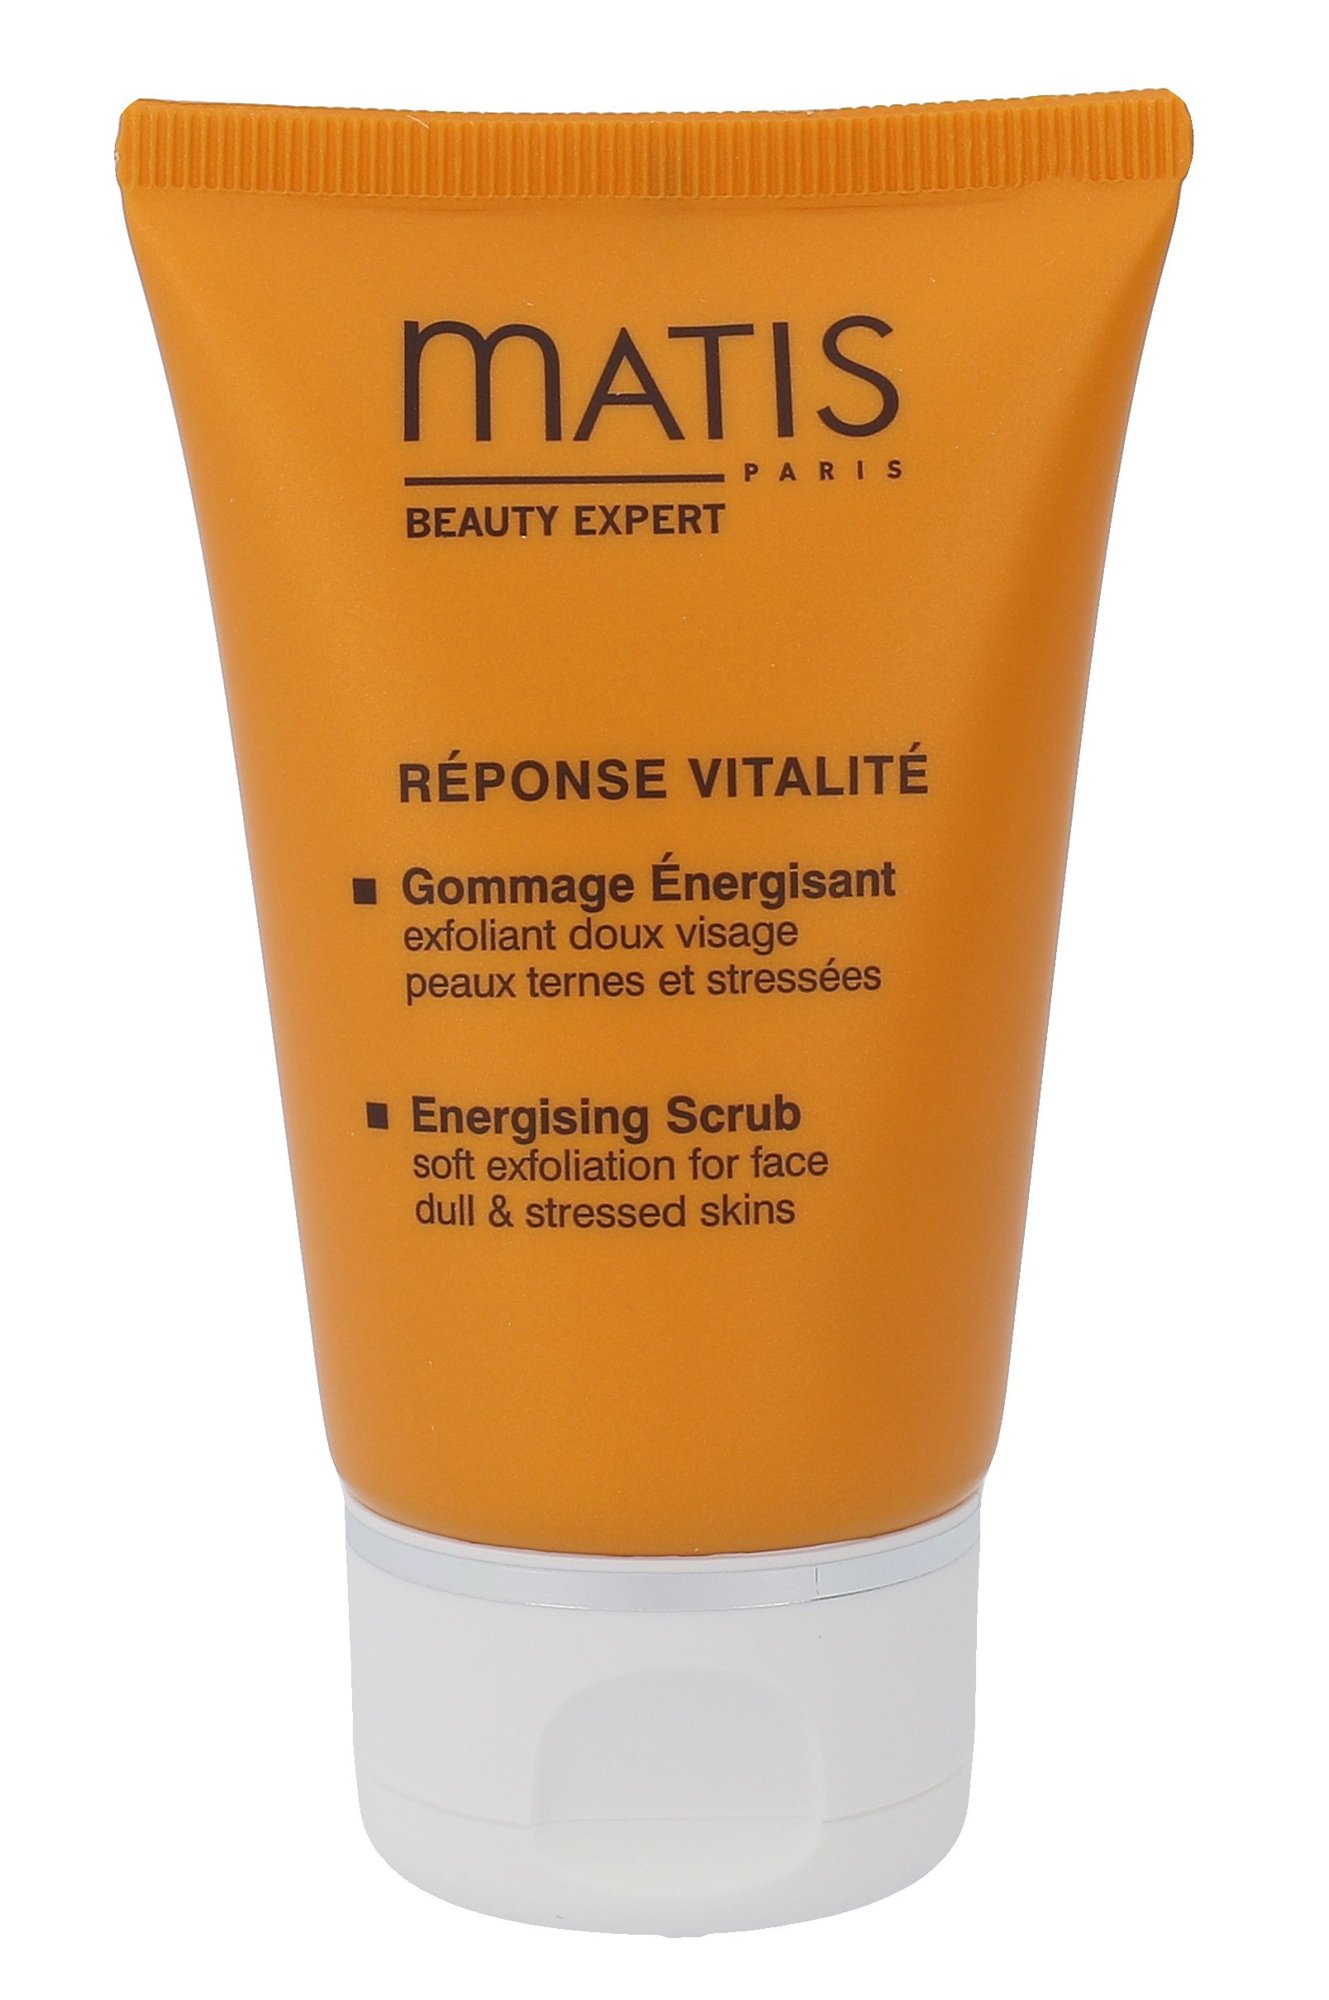 Matis Réponse Vitalité Cosmetic 50ml  Energising Scrub